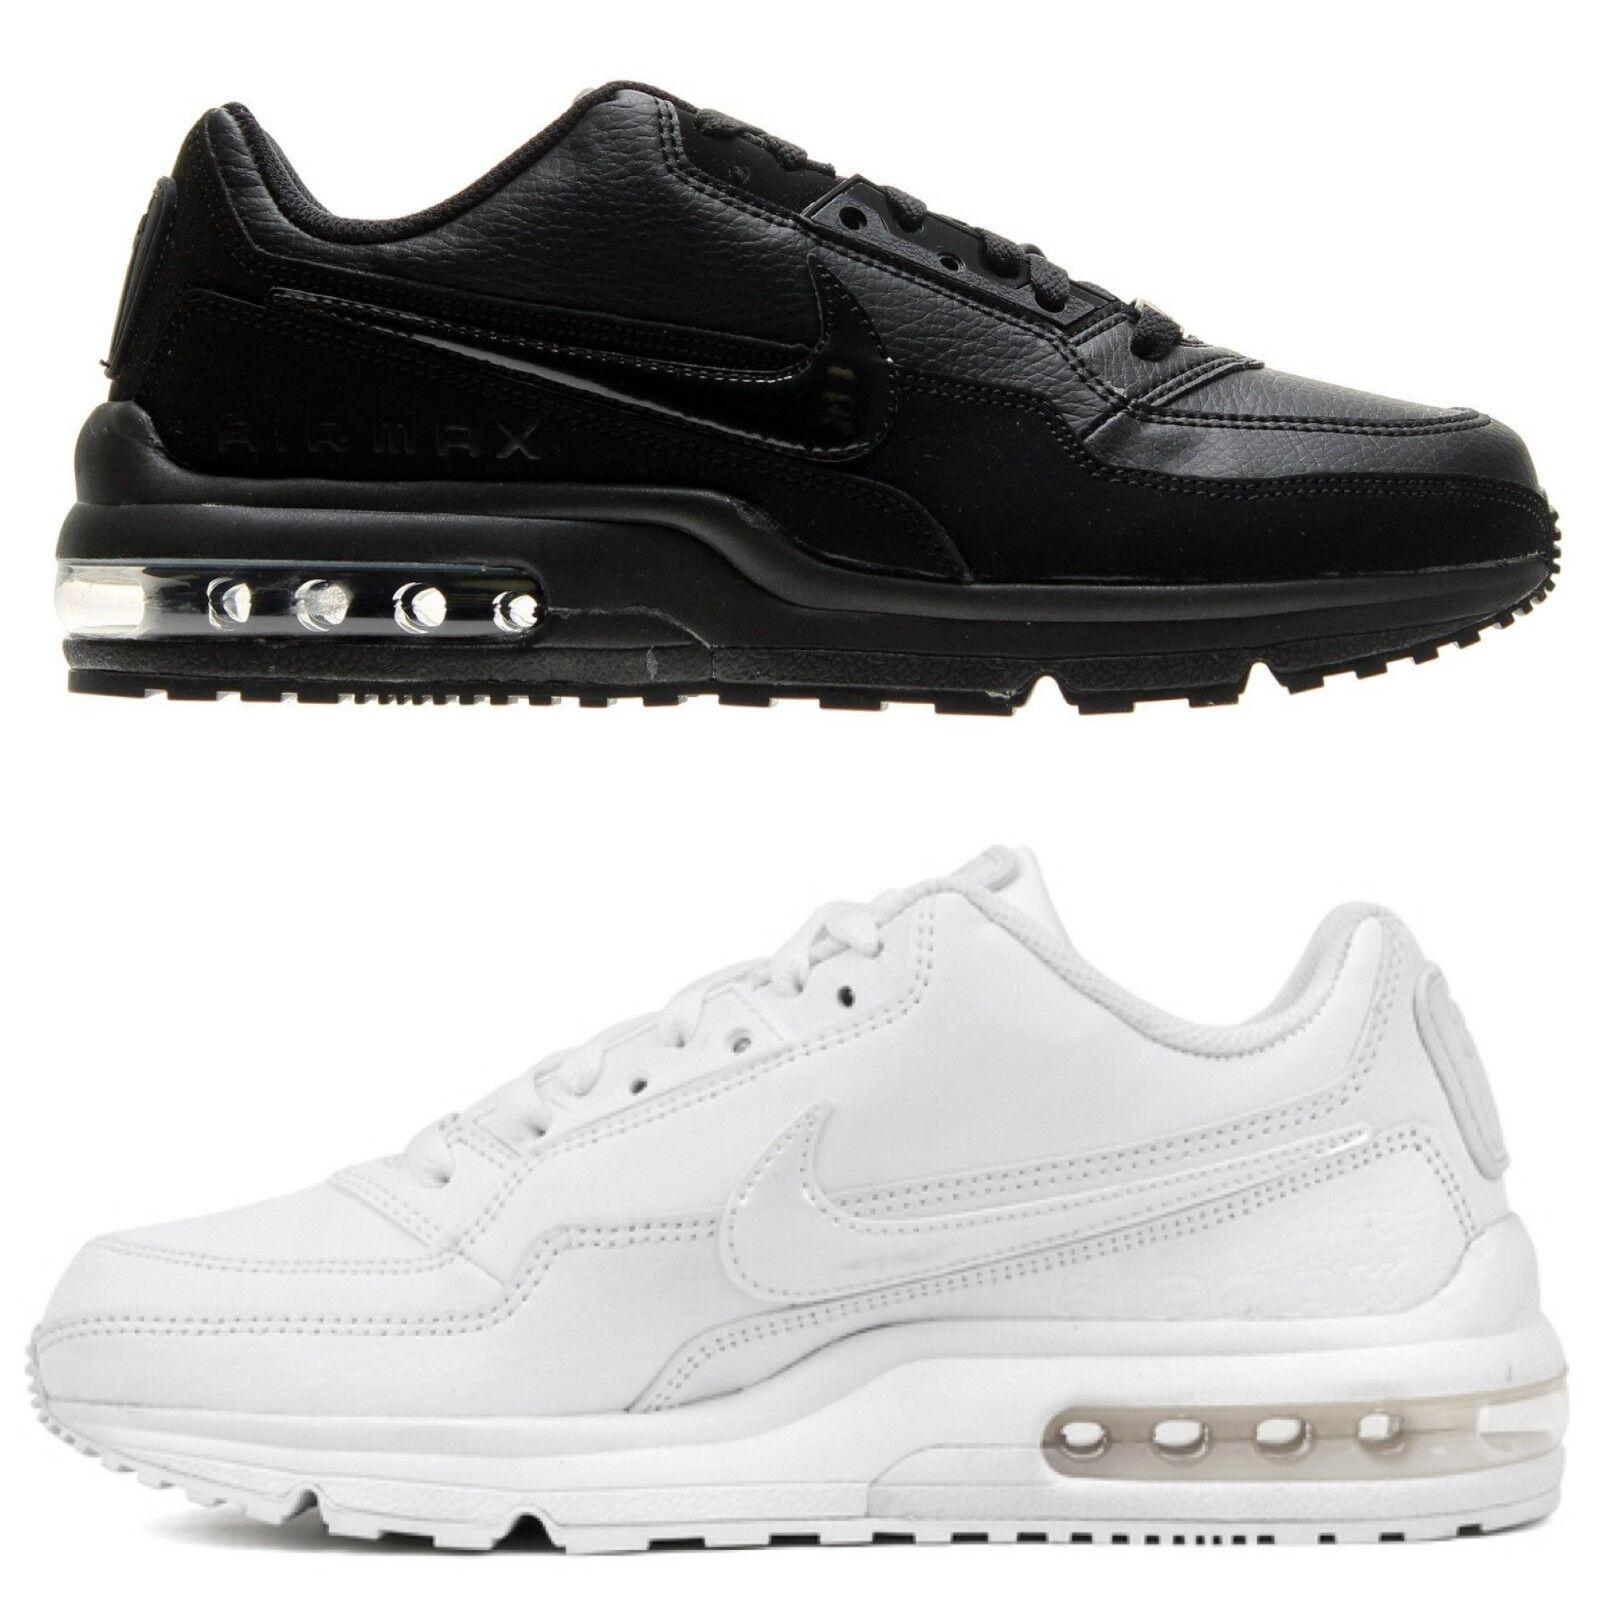 Nike air max. max. max. 3 farben!schwarz 8 8.5 9 9.5 10 10.5 11 weiße männer 218a20